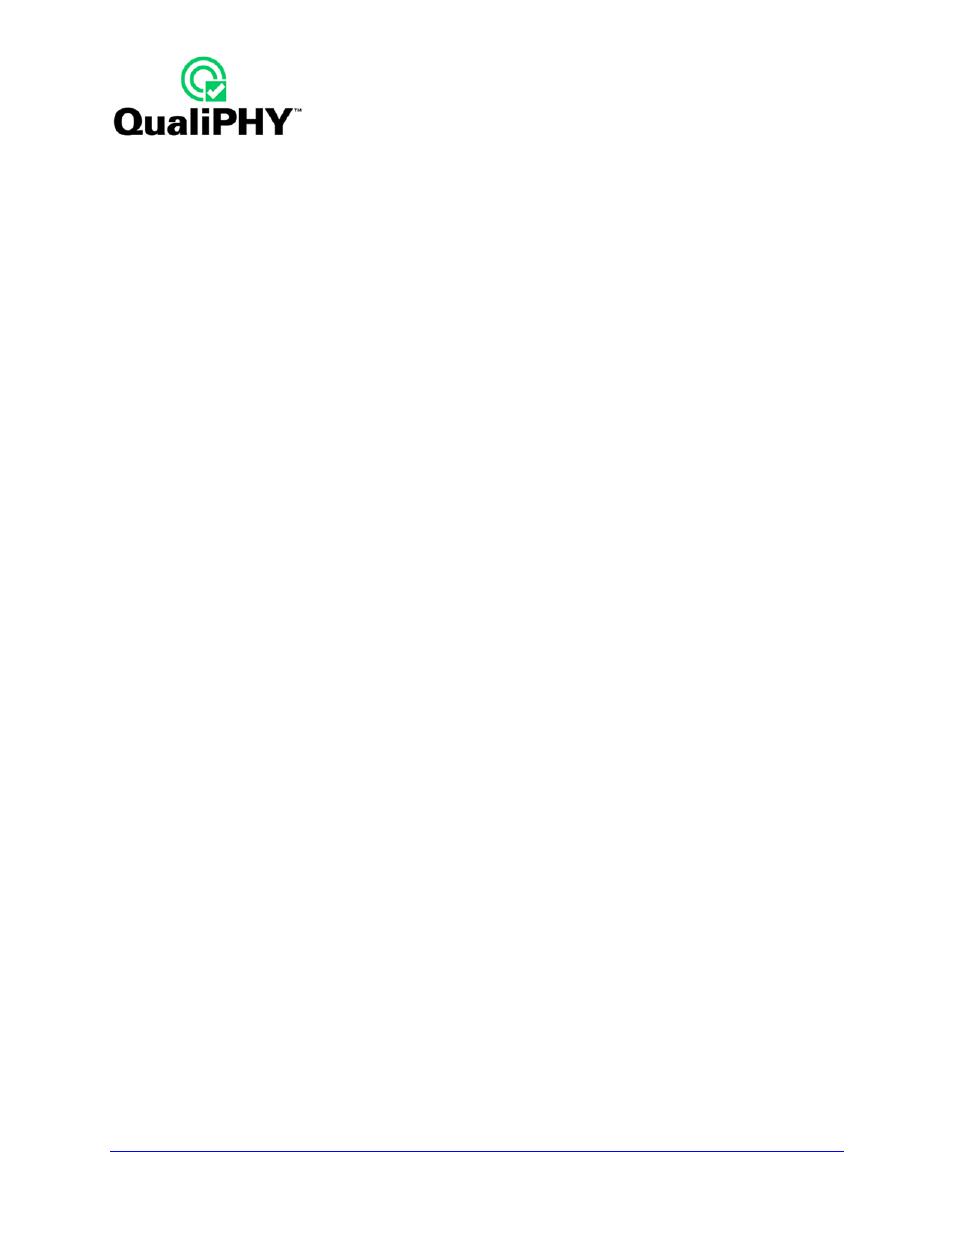 Terrn per cumulative error eye diagram write burst inputs terrn per cumulative error eye diagram write burst inputs teledyne lecroy qphy ddr3 user manual page 36 44 ccuart Image collections